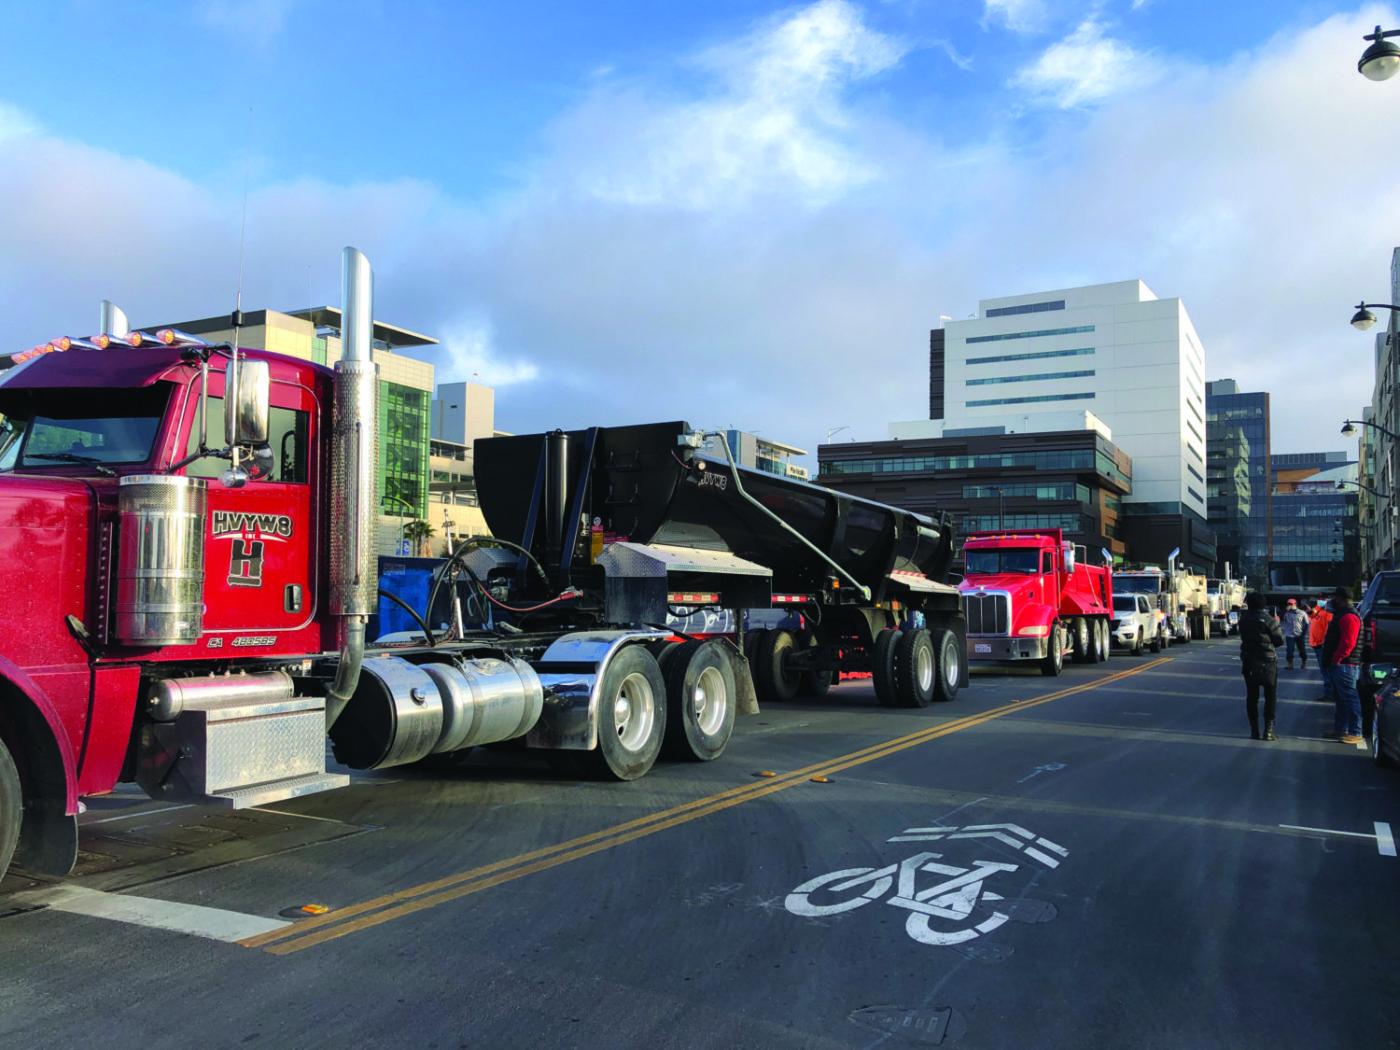 Line-of-Black-dirt-hauling-trucks-blocking-entrance-UCSF-job-site-shutdown-043021-by-Griffin-1400x1050, Black truckers shut down multi-million-dollar UCSF job site for 4.5 hours, Local News & Views